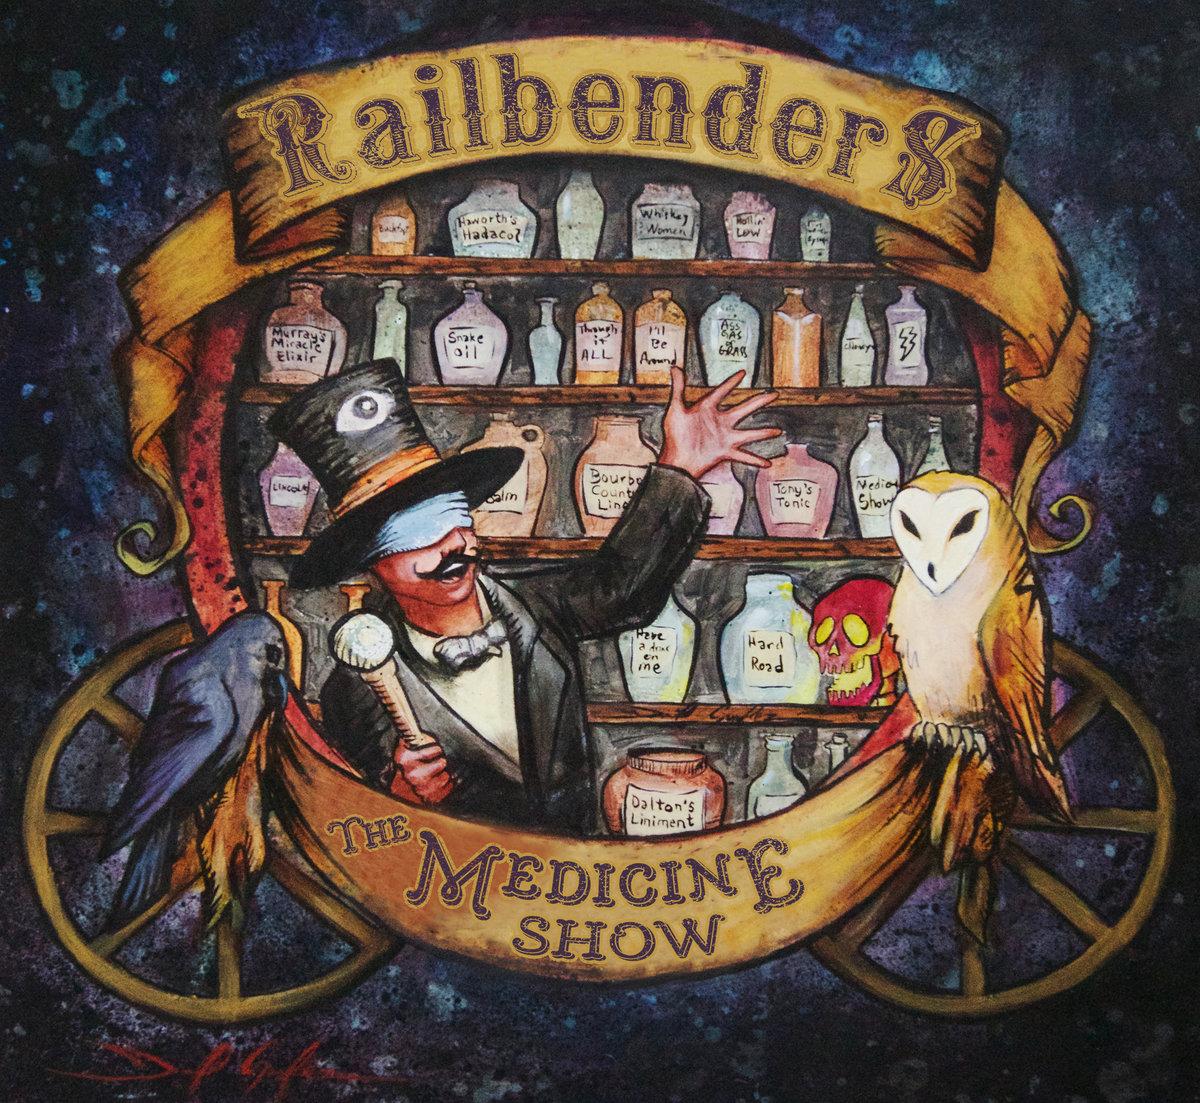 The Medicine Show, Railbenders, 2017